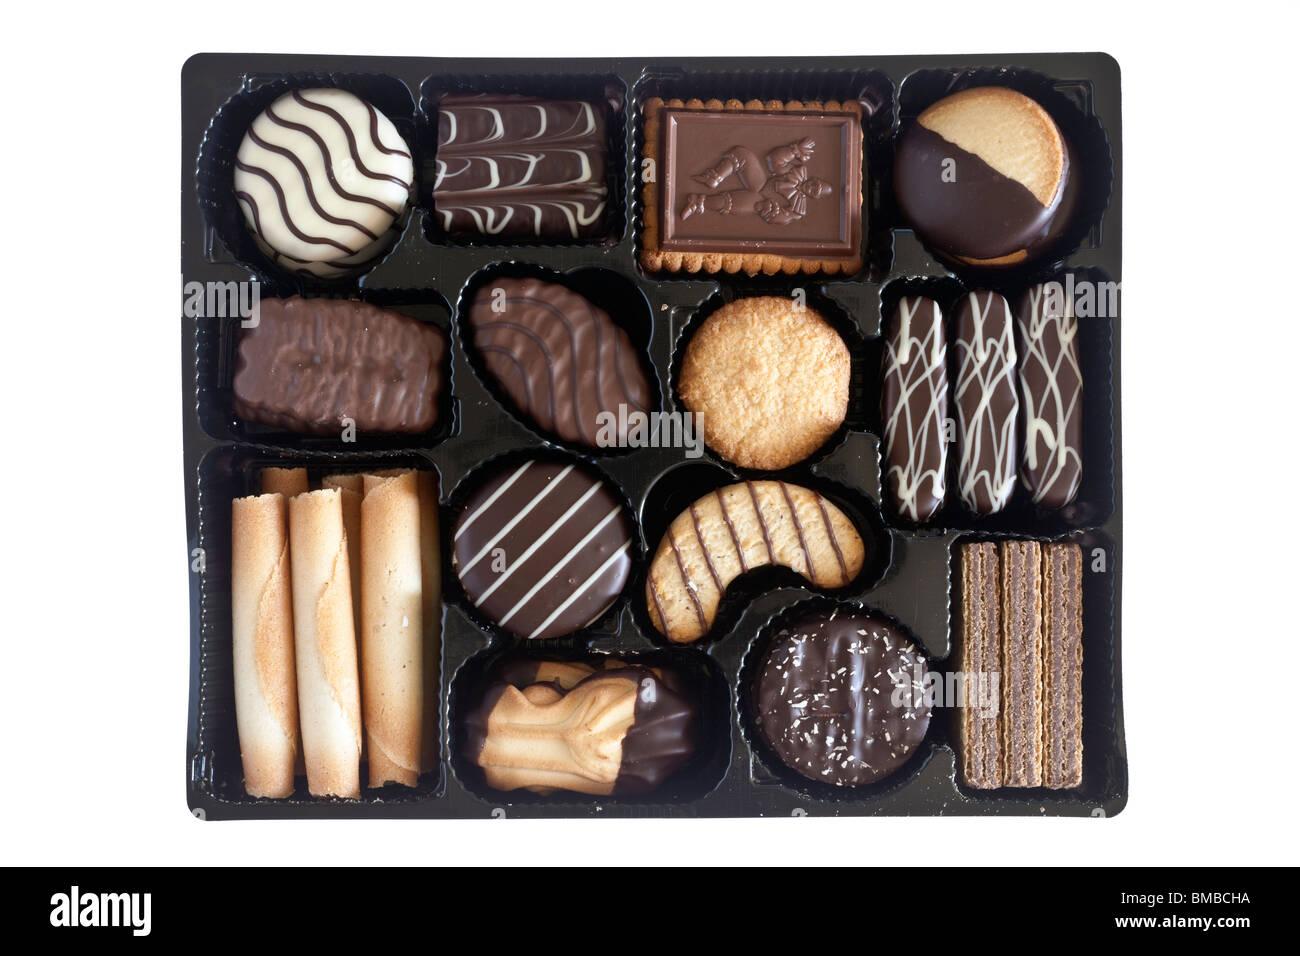 Dark Chocolate Mcvites Calories